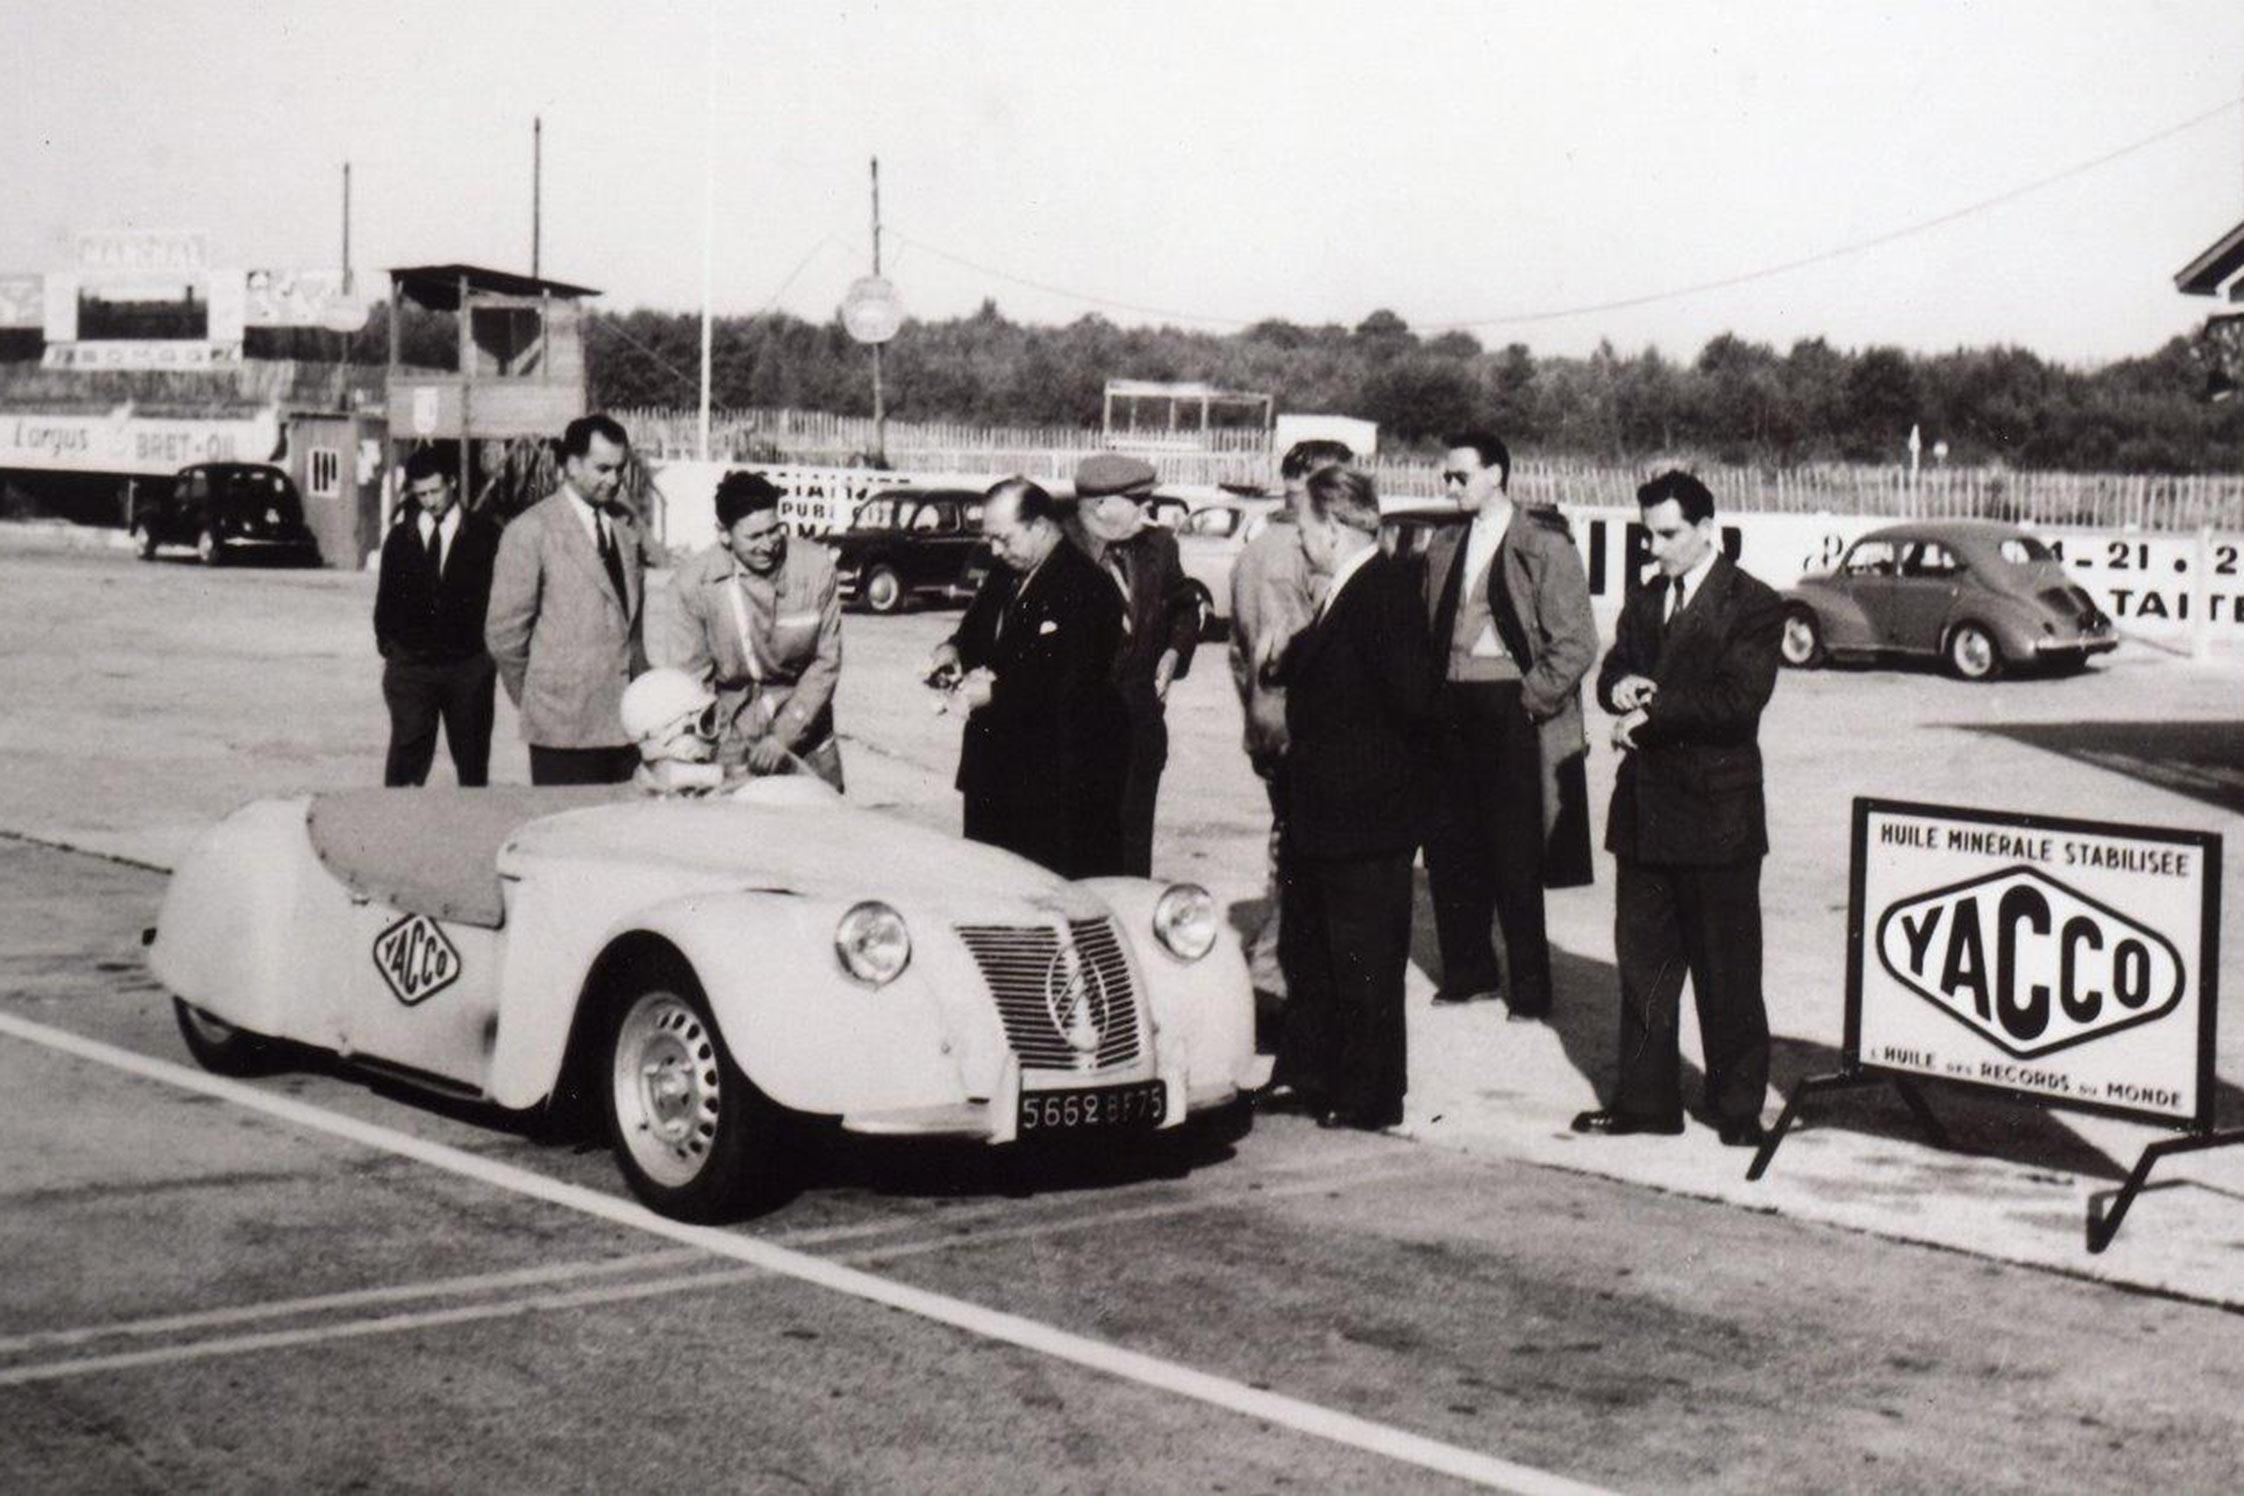 citro u00ebn 2cv  u00ab barbot  u00bb  1953  - l u0026 39 autodrome de montlh u00e9ry f u00eate ses 90 ans